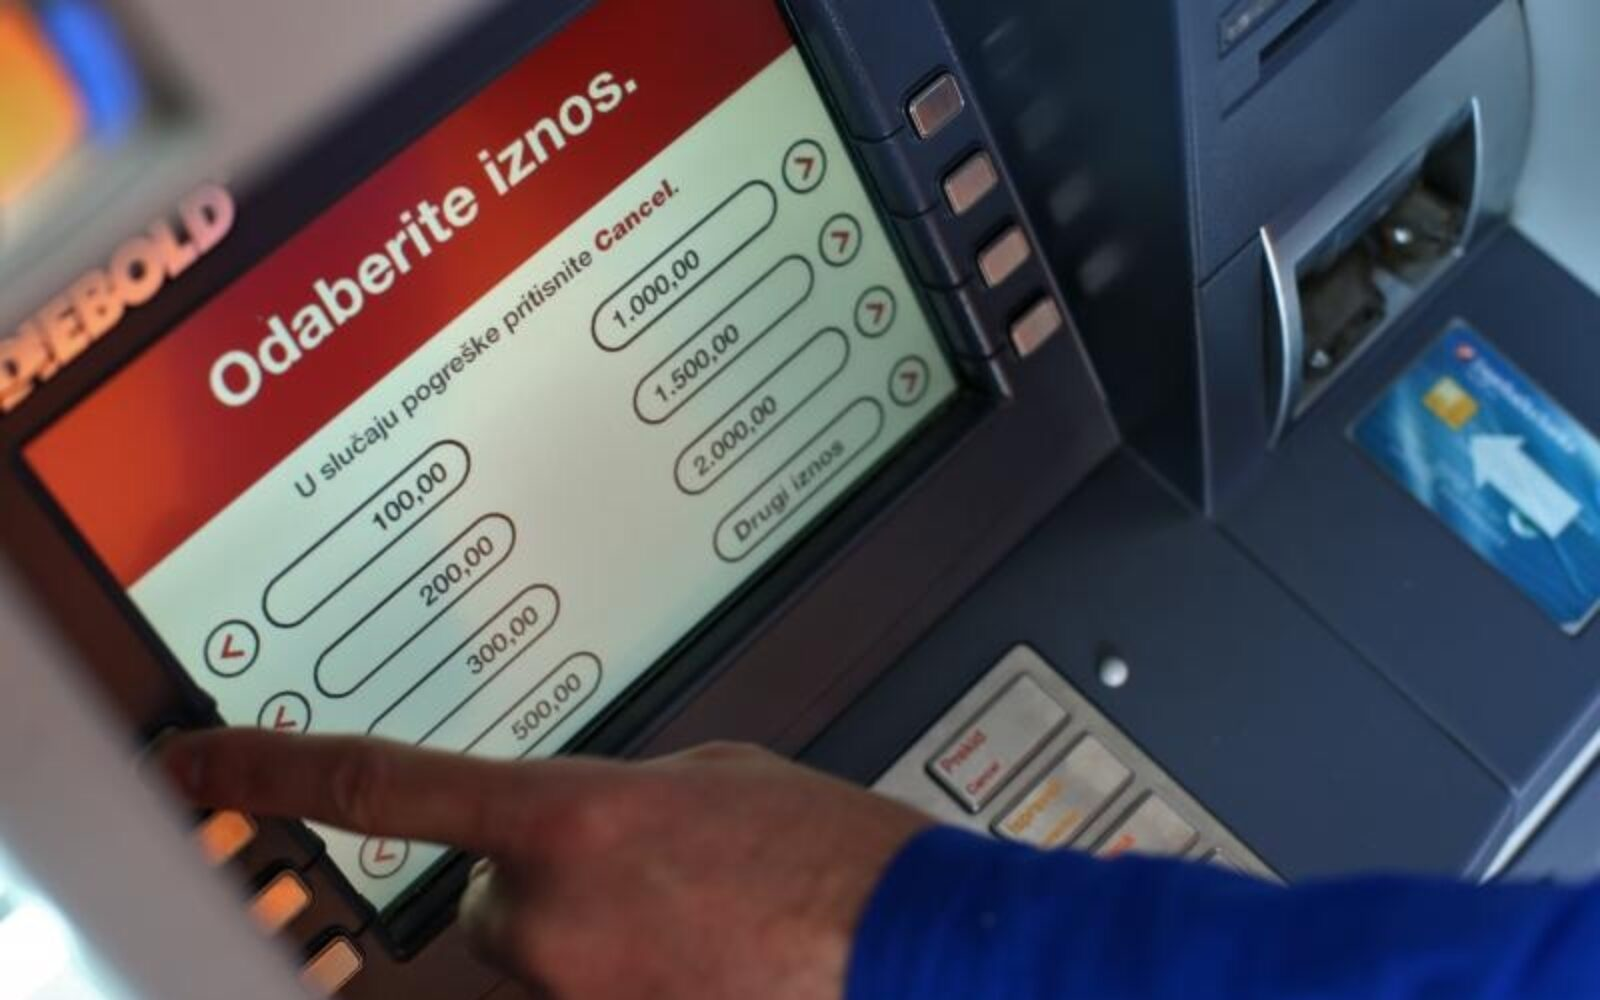 Zagrebačka banka prva uvela kredite bez potrebe odlaska u banku - Poslovni  dnevnik